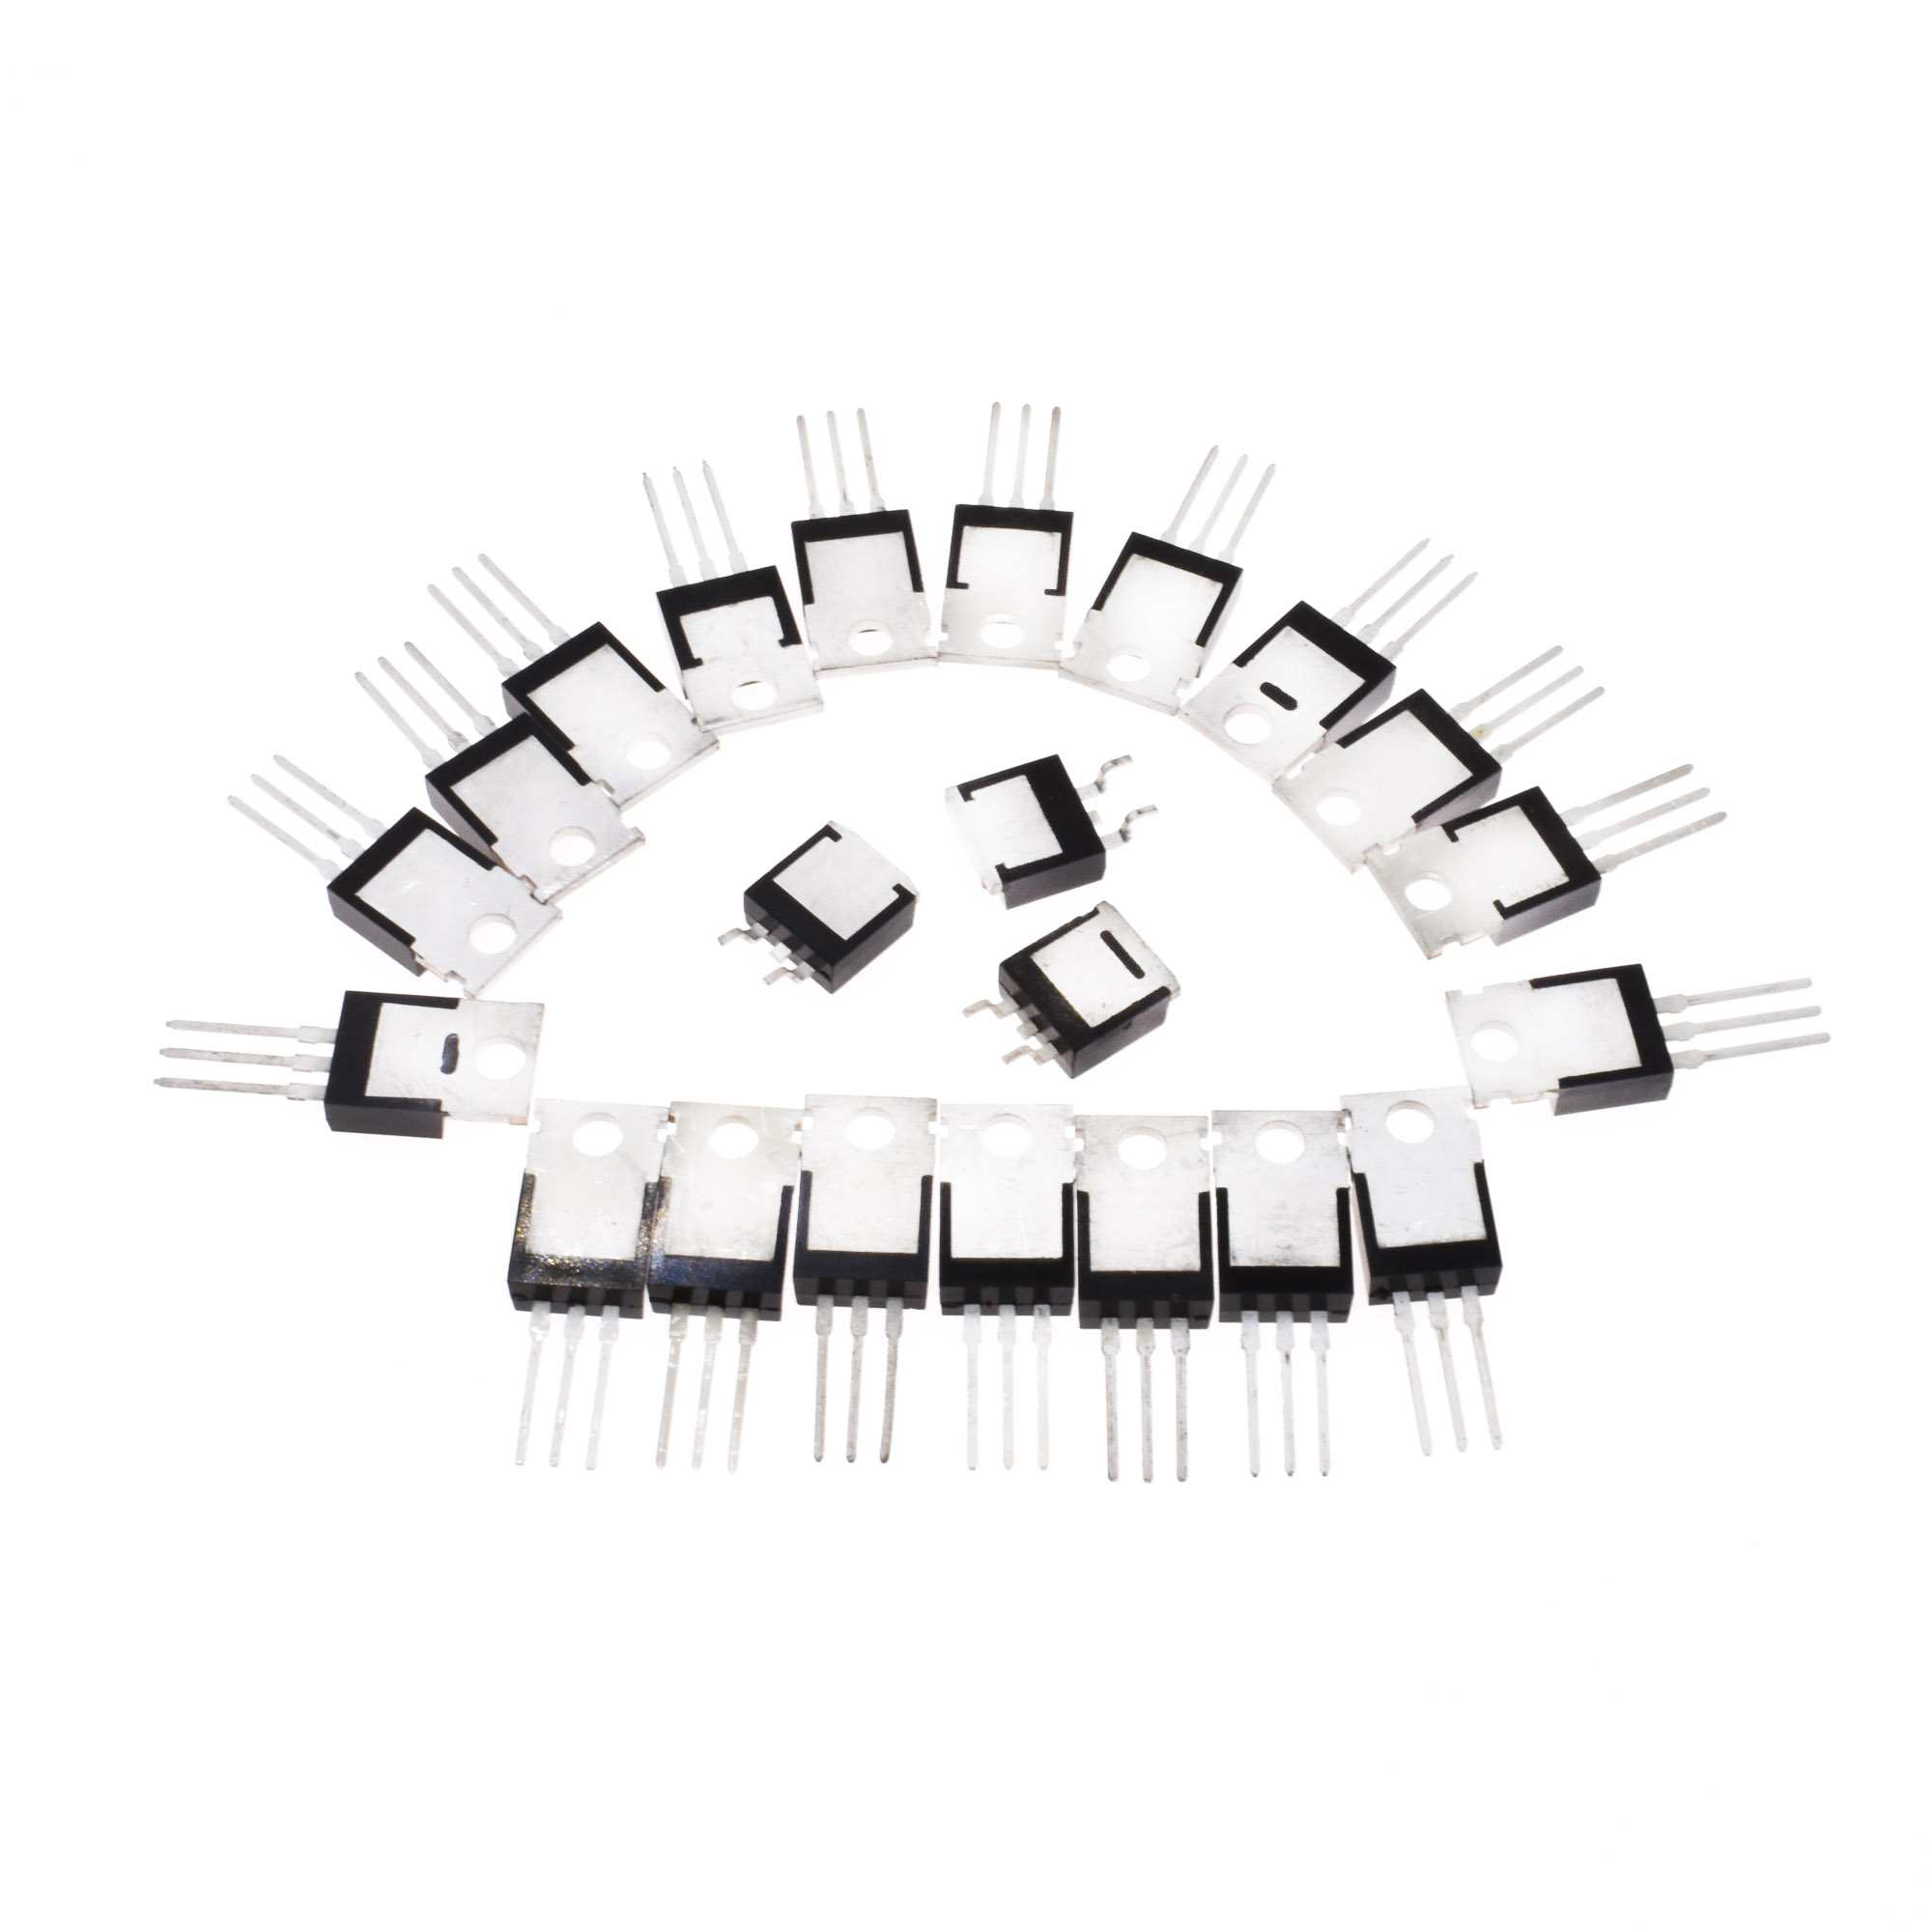 Transistor Irf Irf730 Irf Irf840 Irf540n Irf630